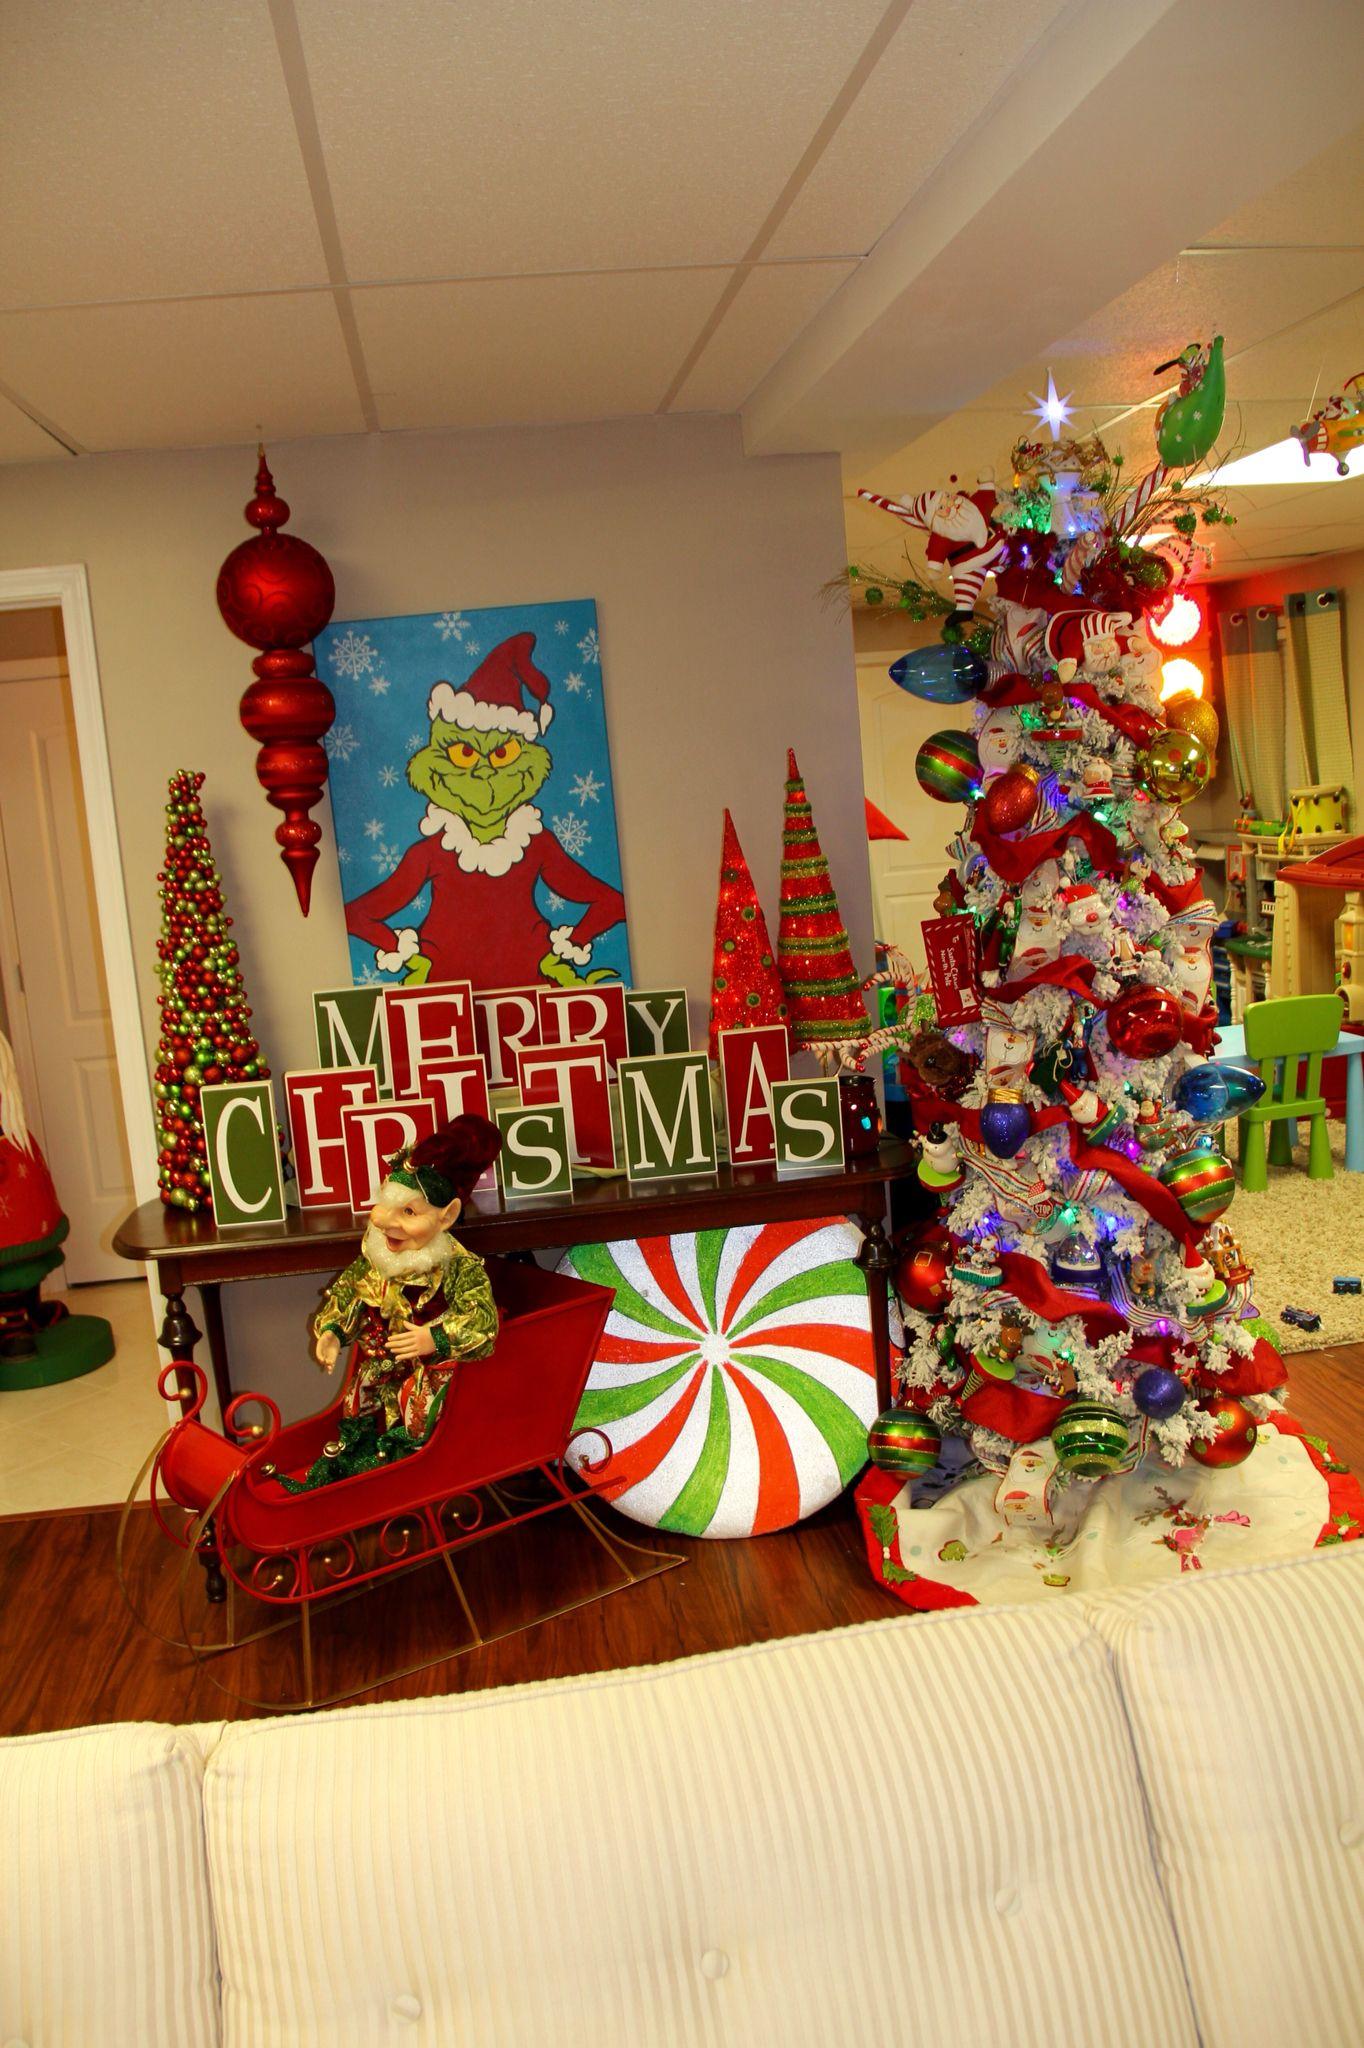 Grinch Painting Santa Tree Grinch Christmas Decorations Indoor Christmas Decorations Grinch Christmas Tree